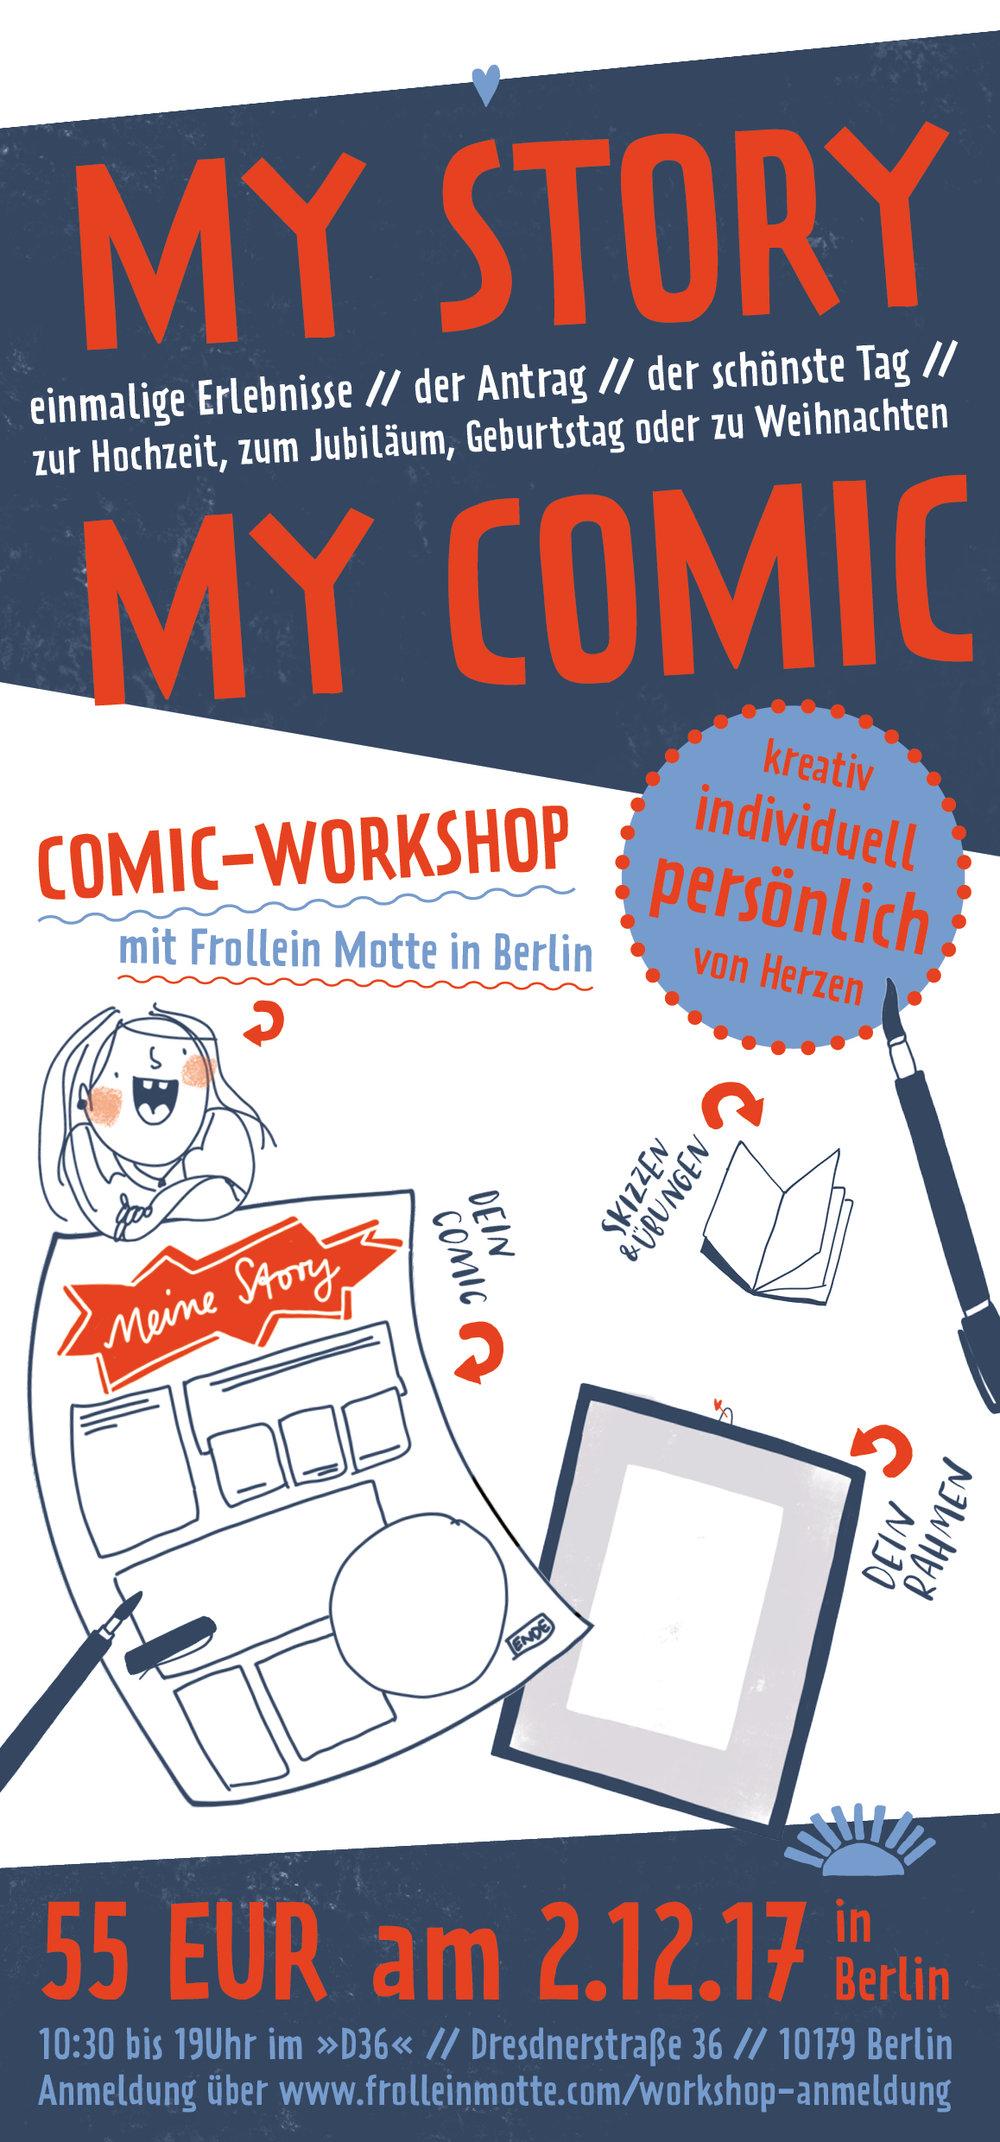 WS_werbung_comic-workshop_mystory2.jpg